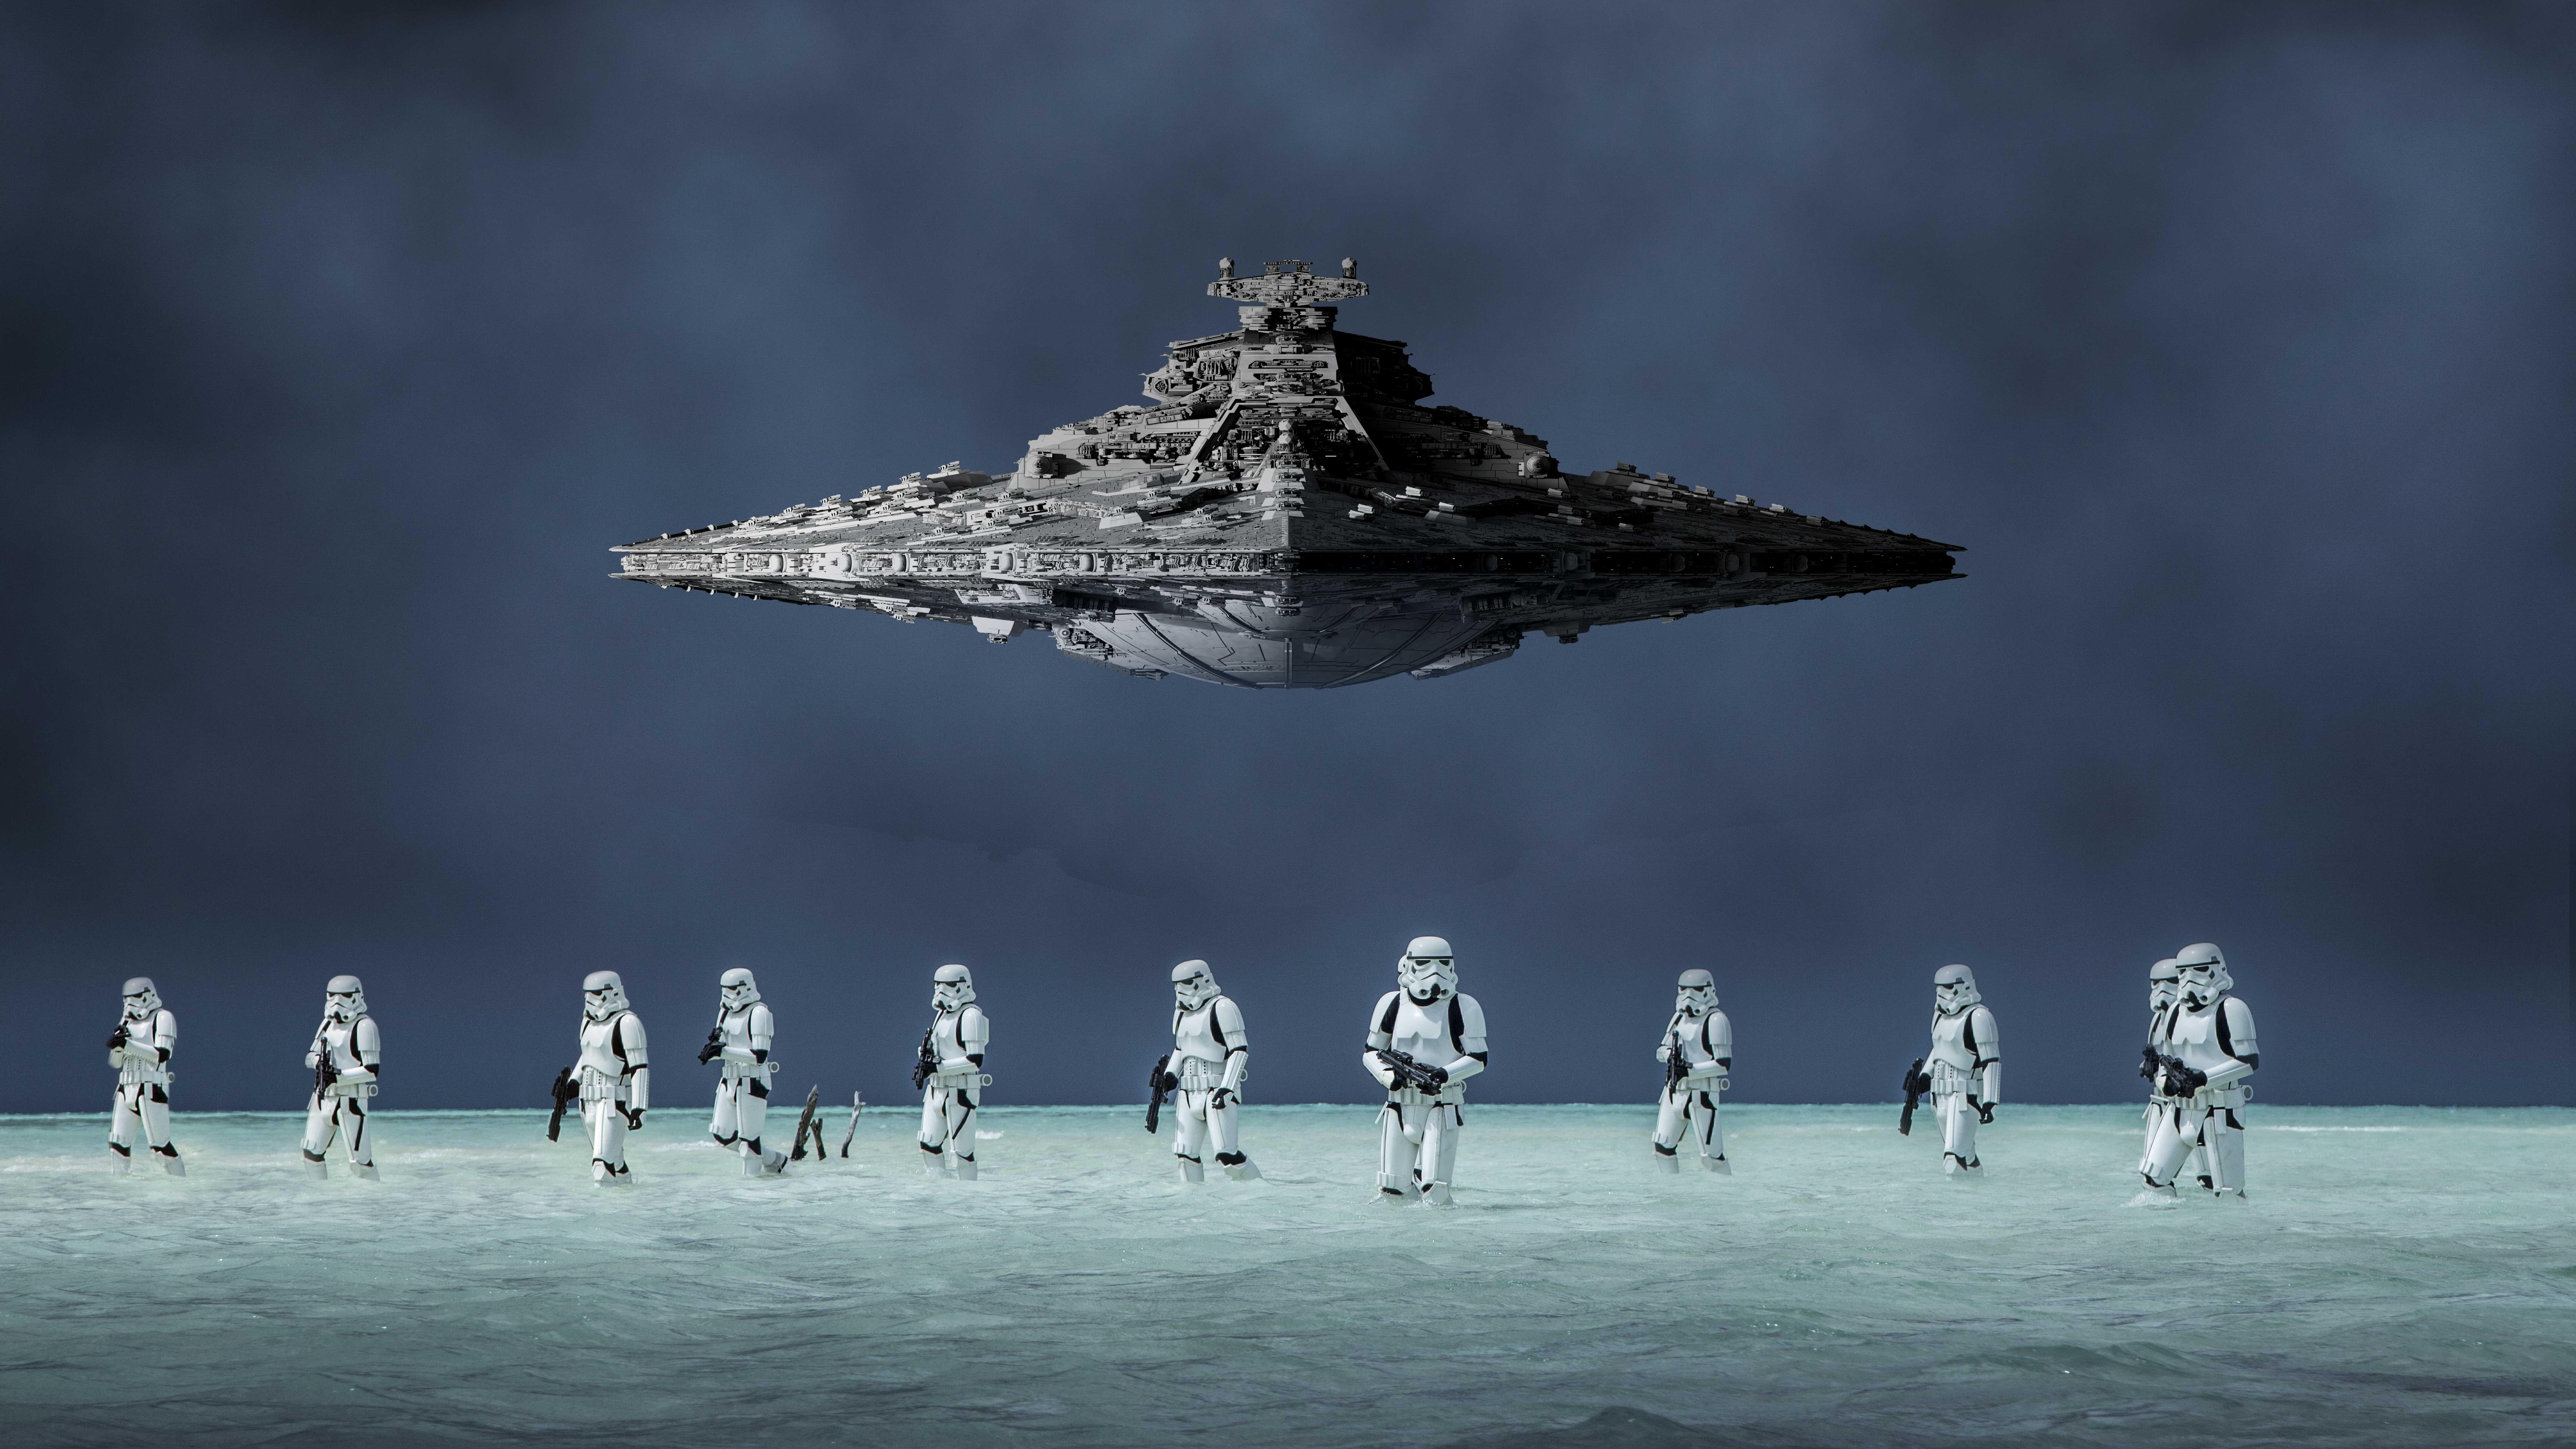 Star Wars Stormtroopers Wallpapers 21 9 And 16 9 Star Wars Hd Wallpaper Wallpaper